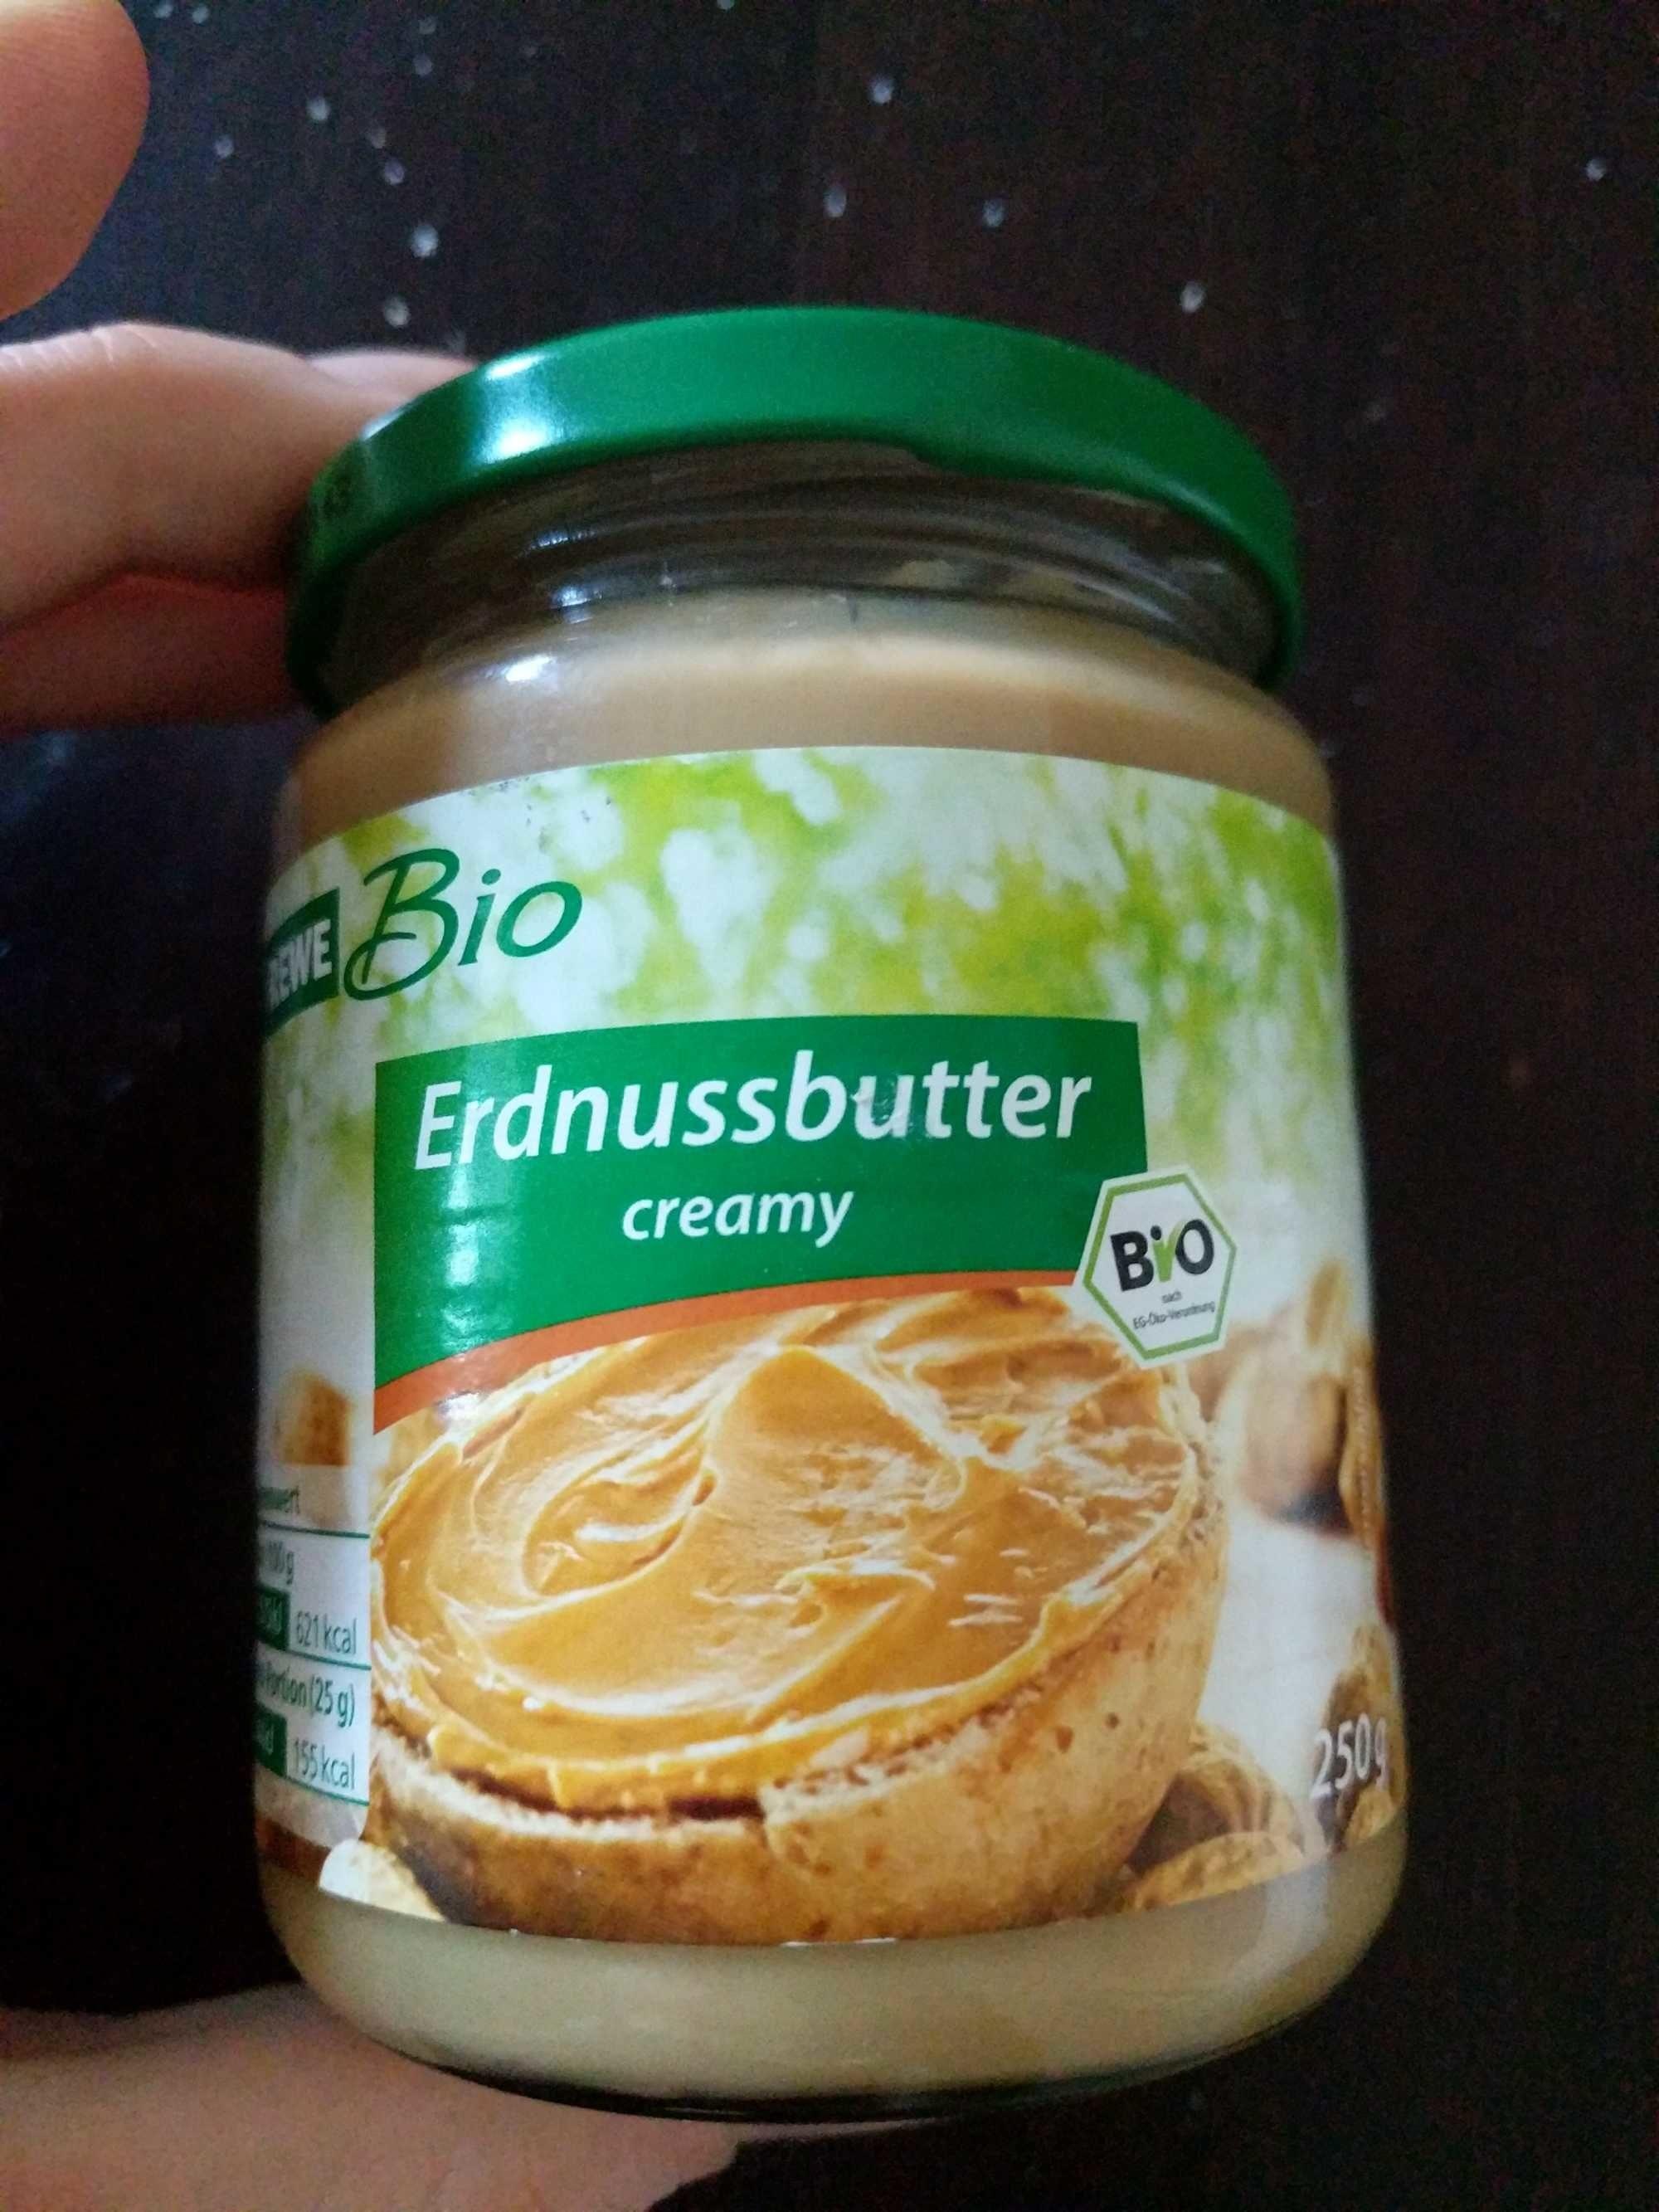 Erdnussbutter creamy - Product - en